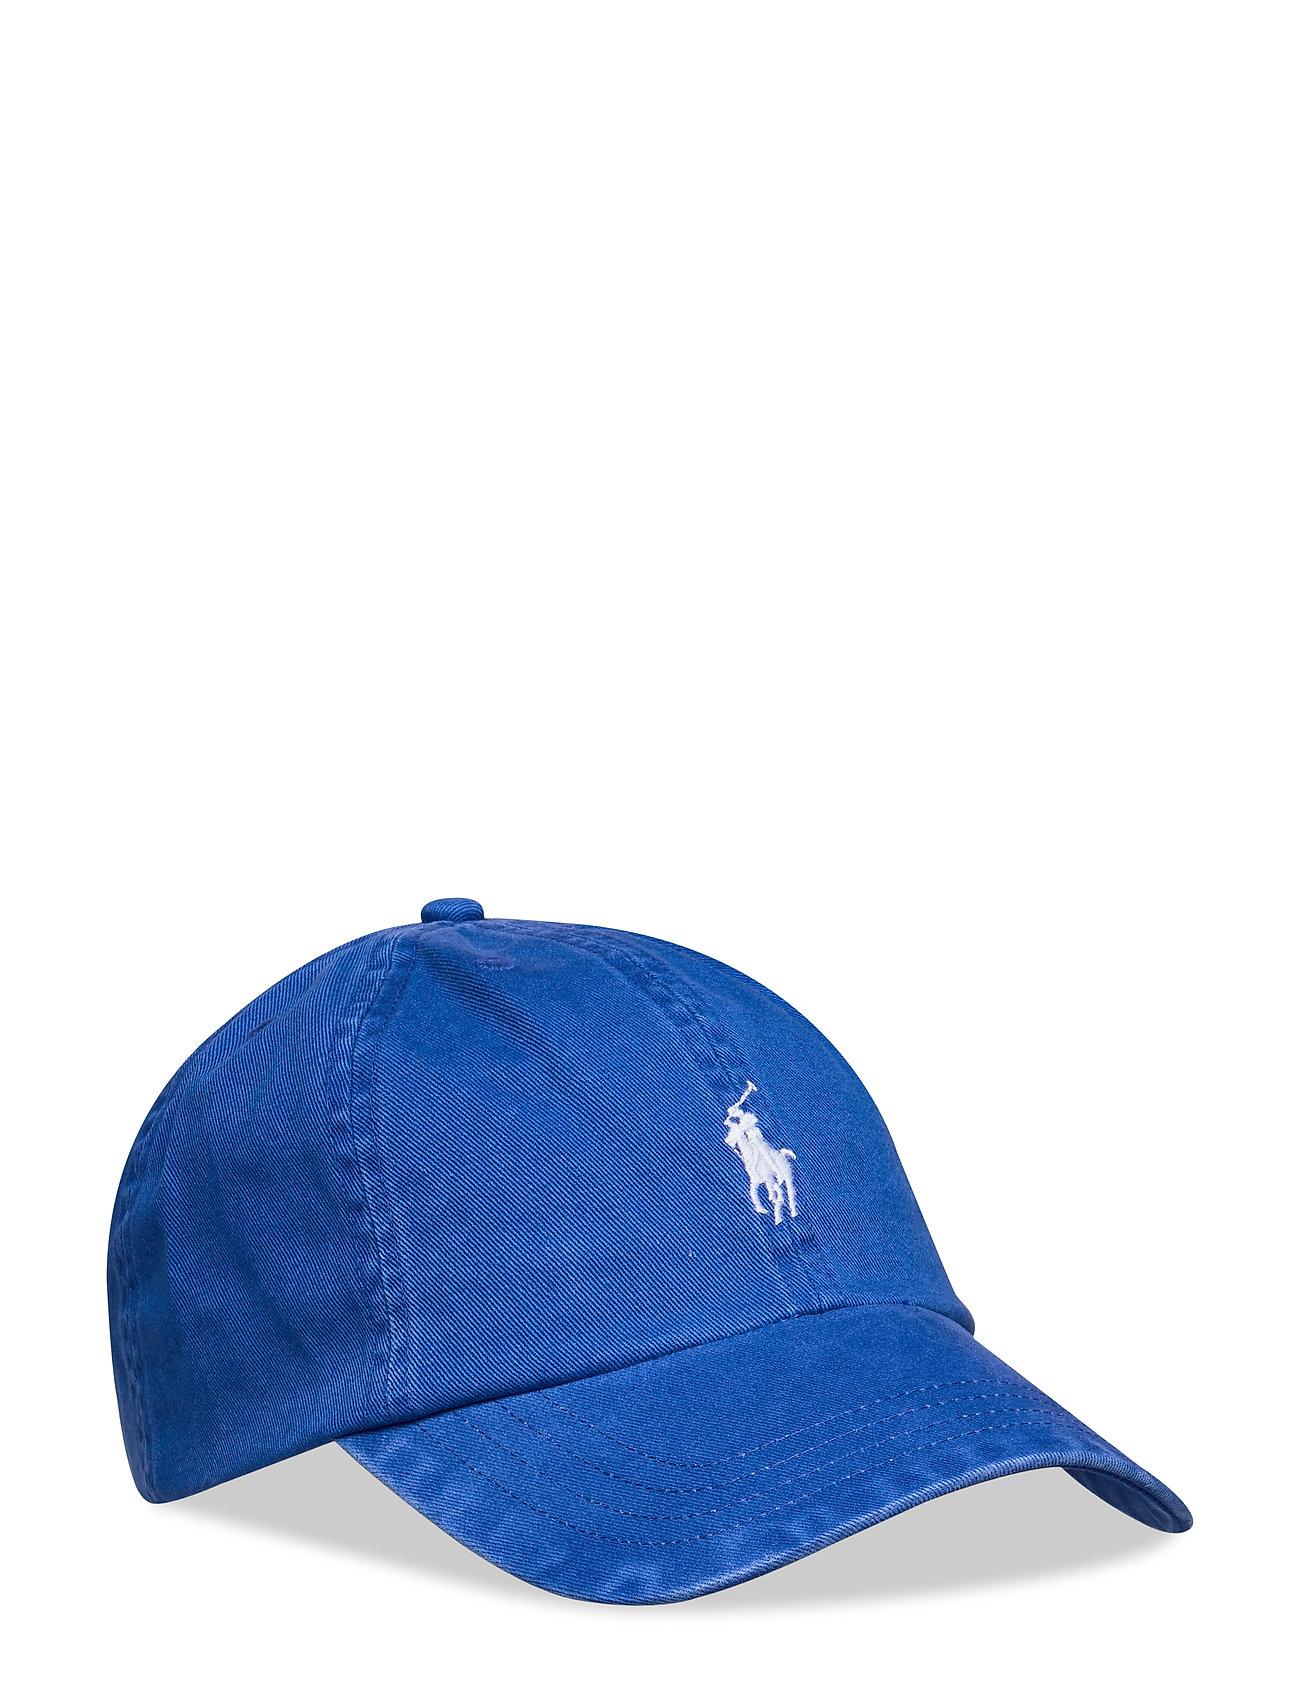 Ralph Lauren Kids Cotton Chino Baseball Cap - PACIFIC ROYAL